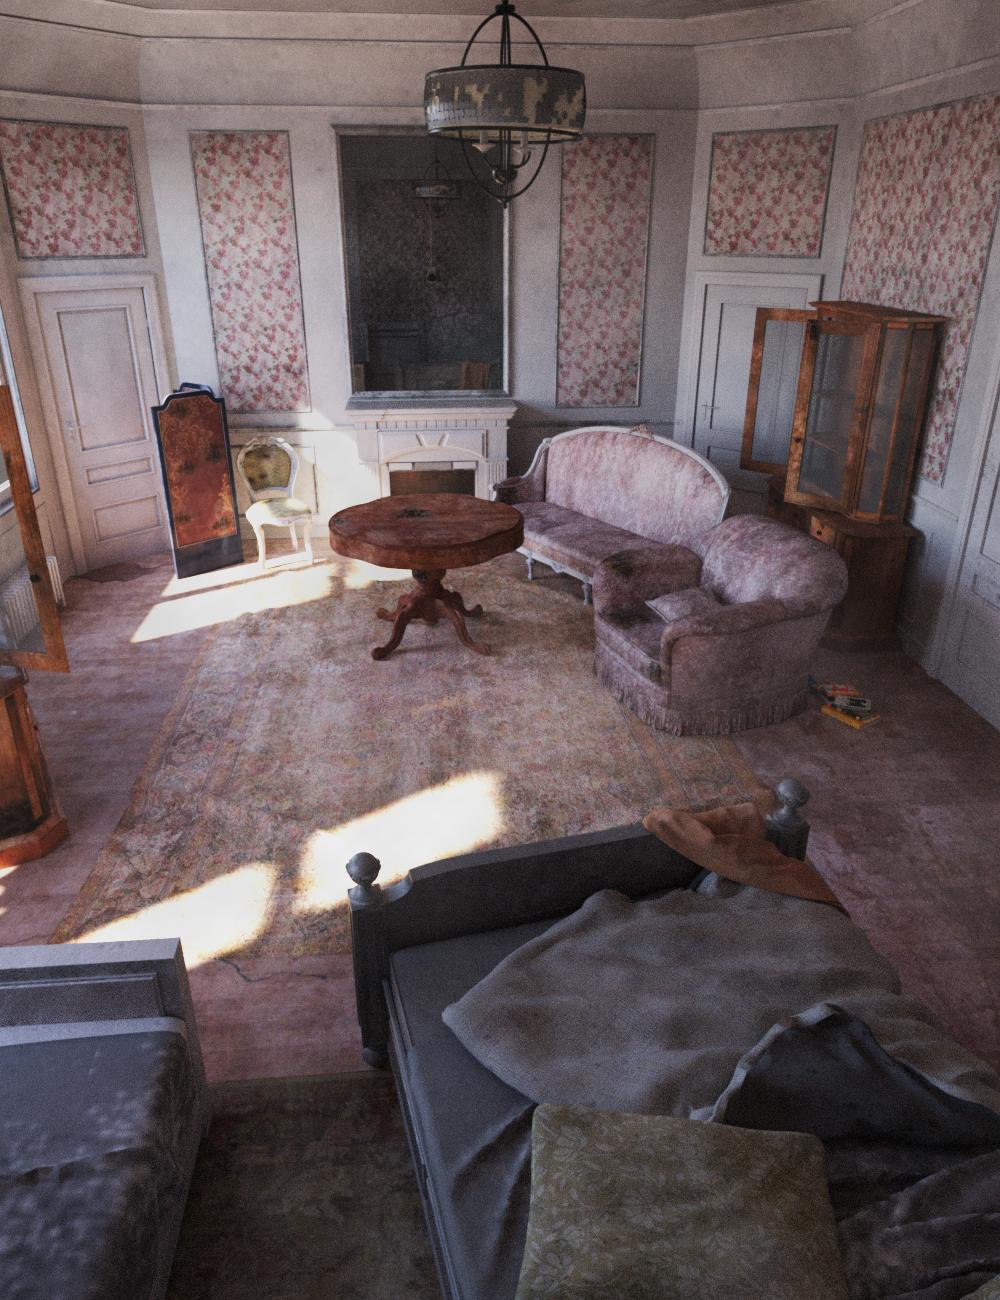 Tesla Abandoned House by: Tesla3dCorp, 3D Models by Daz 3D